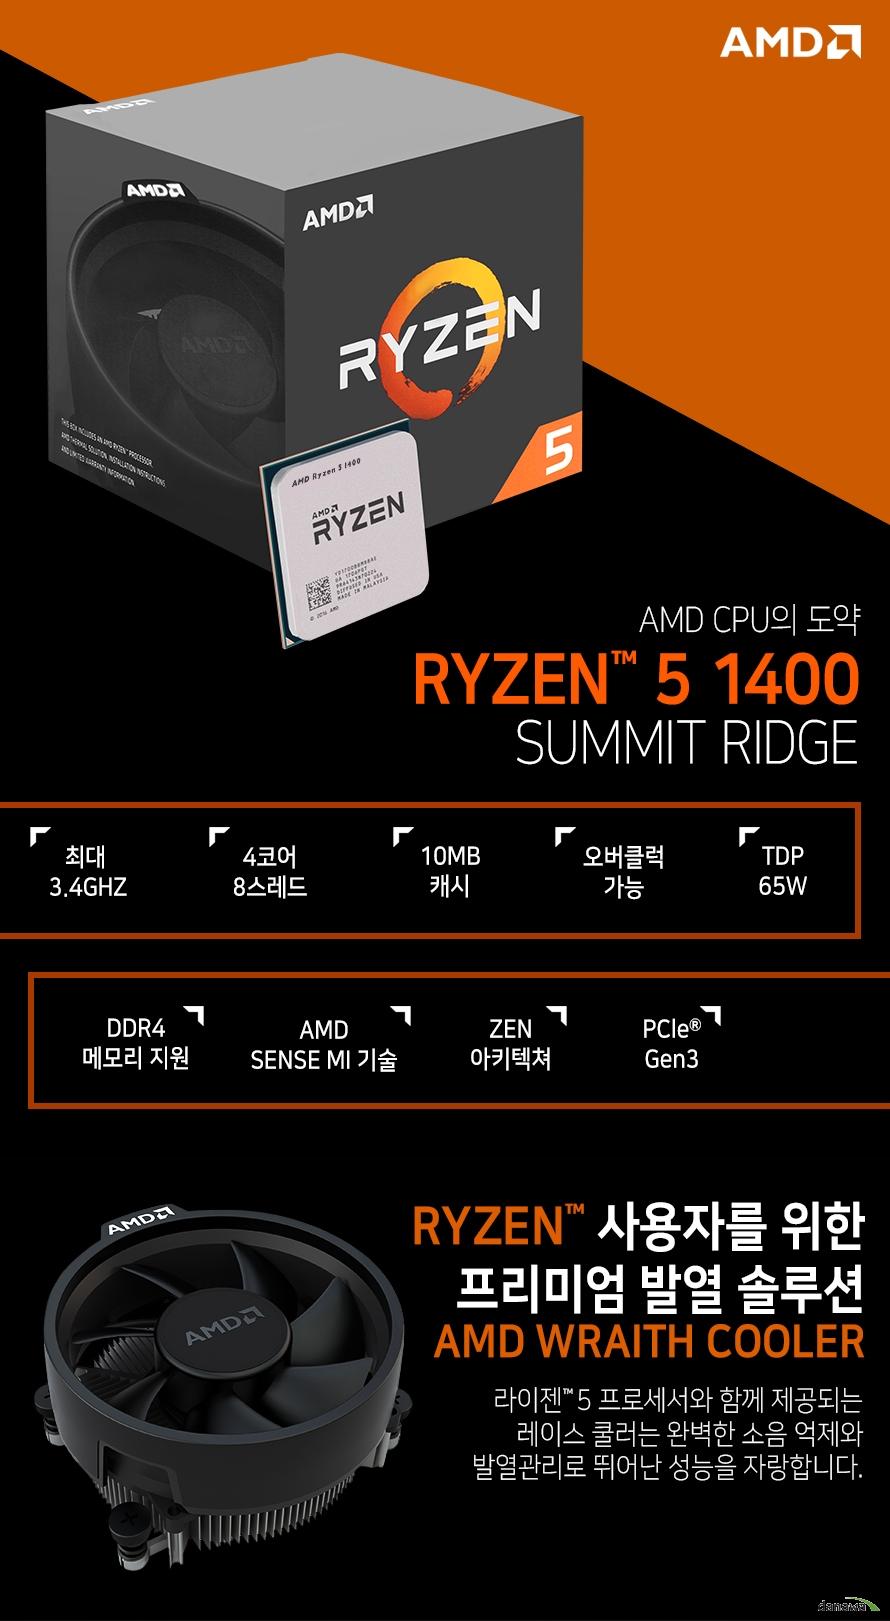 AMD CPU의 도약         RYZEN 5 1400         SUMMIT RIDGE                  최대 3.4GHZ          4코어 8스레드         10MB 캐시         오버클럭 가능         TDP 65W         DDR4 메모리 지원         AMD SENSE MI 기술         ZEN 아키텍쳐         PCle Gen 3                  RYZEN 사용자를 위한 프리미엄 발열 솔루션         AMD WRAITH COOLER                  라이젠 5 프로세서와 함께 제공되는 레이스 쿨러는          완벽한 소음 억제와 발열관리로 뛰어난 성능을 자랑합니다.